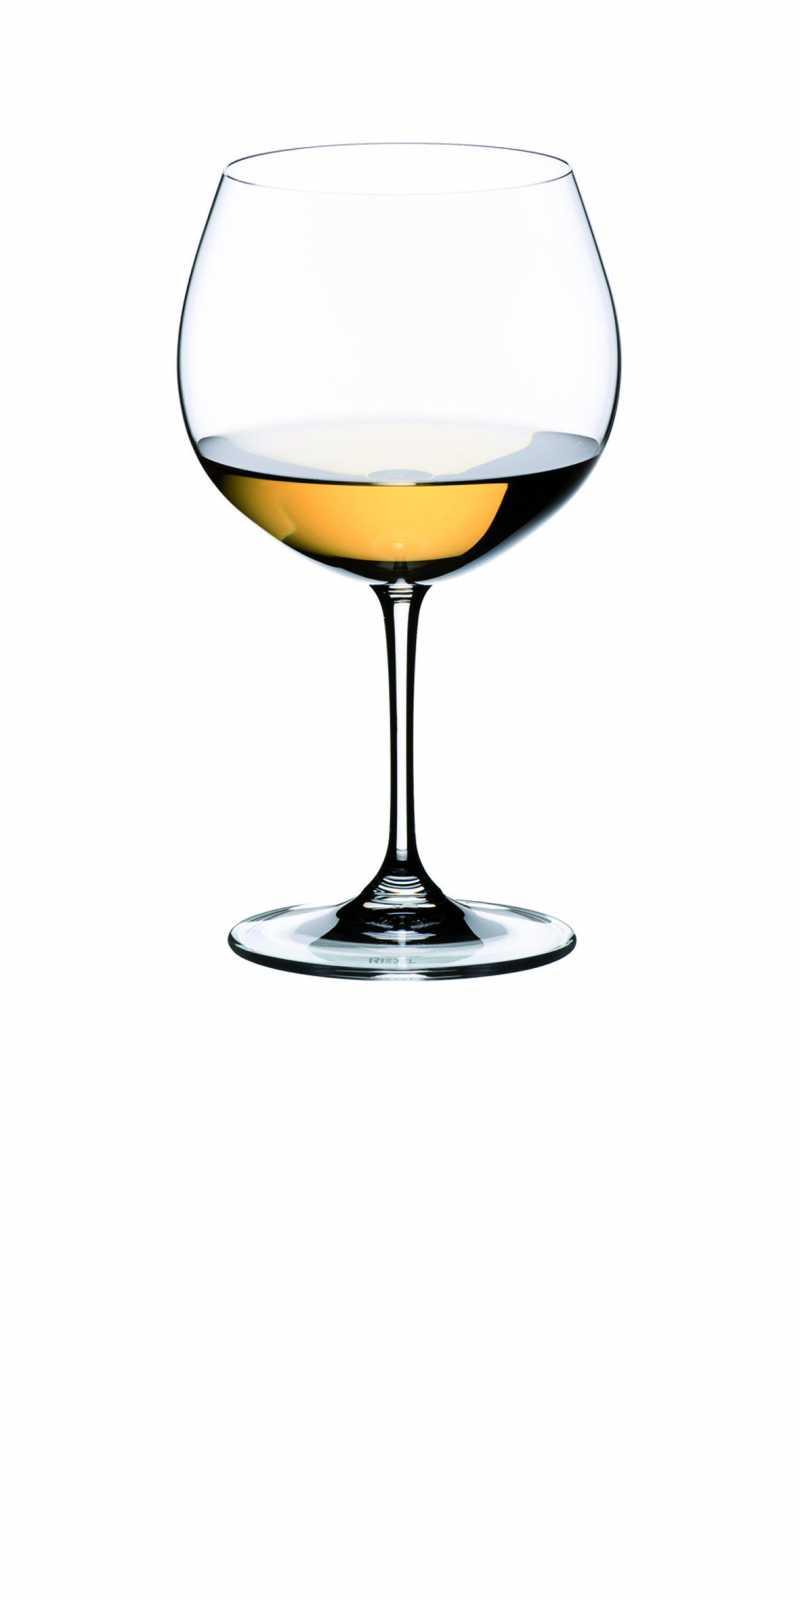 Онлайн каталог PROMENU: Набор (2 шт) бокалов для вина_Chardonnay(Montrachet) 0,6 л Riedel Vinum  (6416/97) Riedel 6416/97